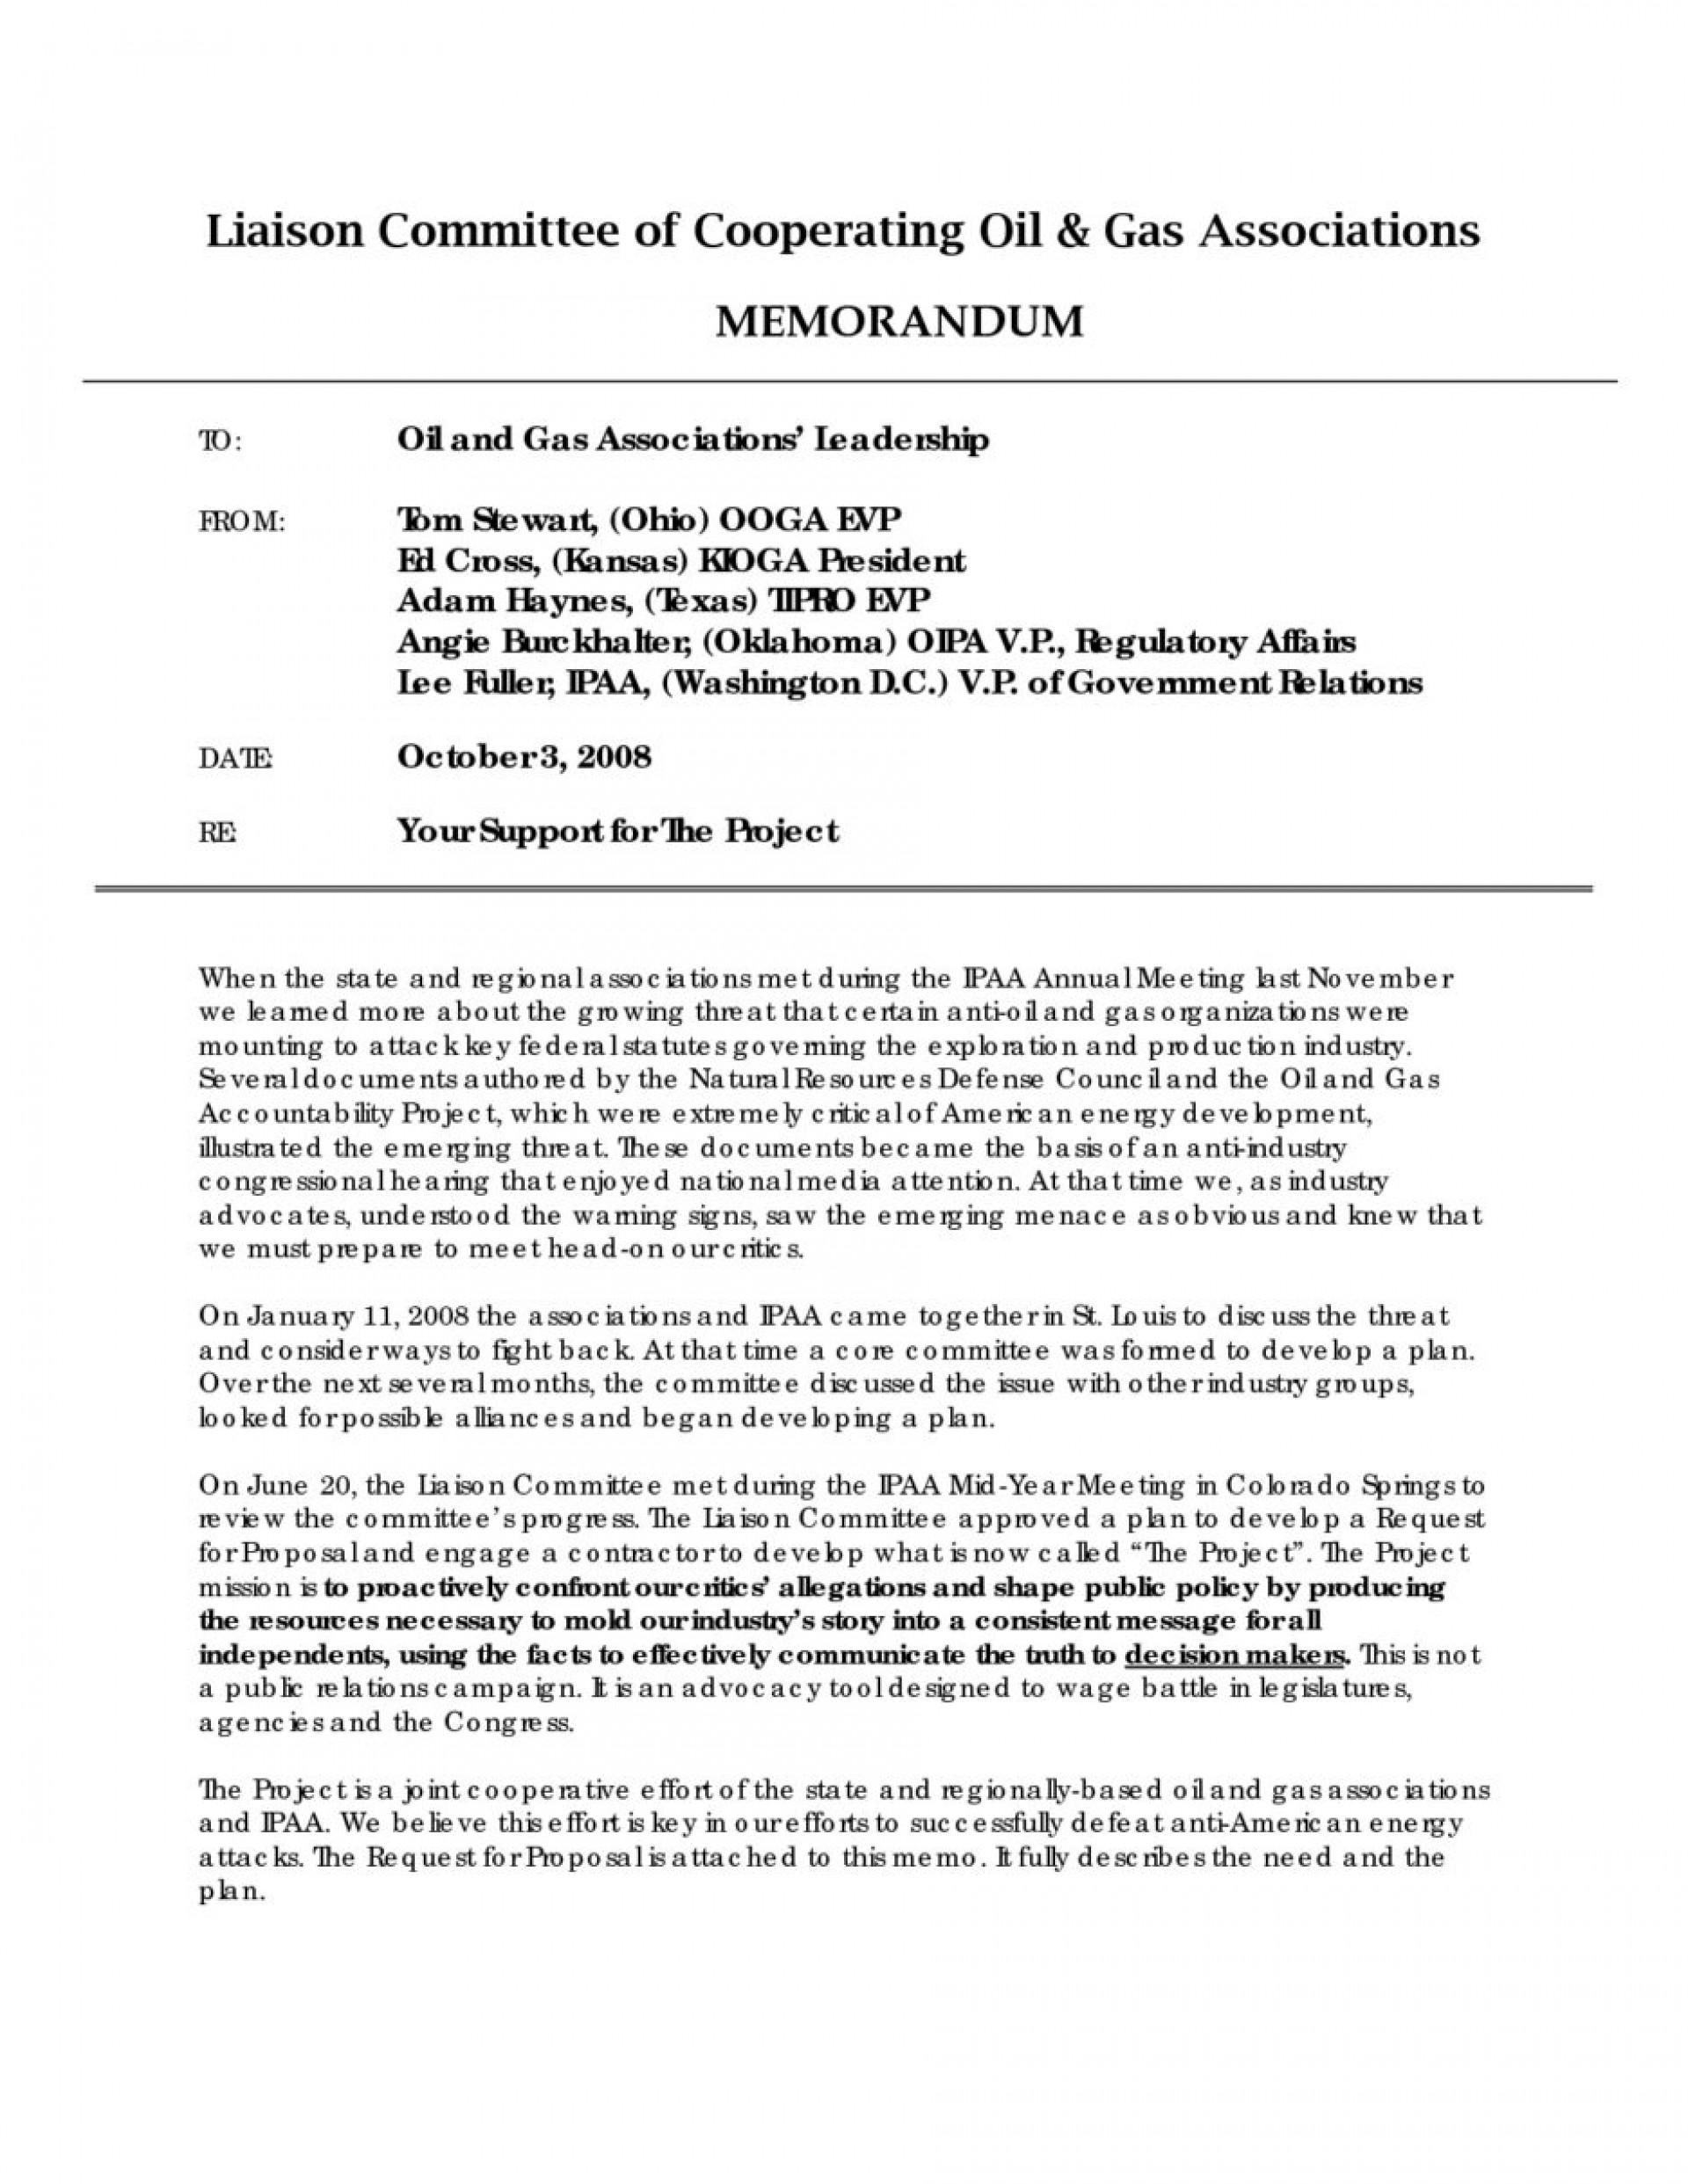 004 Essay Example Unsung Heroes Richard Iii Hero Villain Heroism Definition Short Personal Spm Malaysia My Fantastic Of India Intro Mom 1920